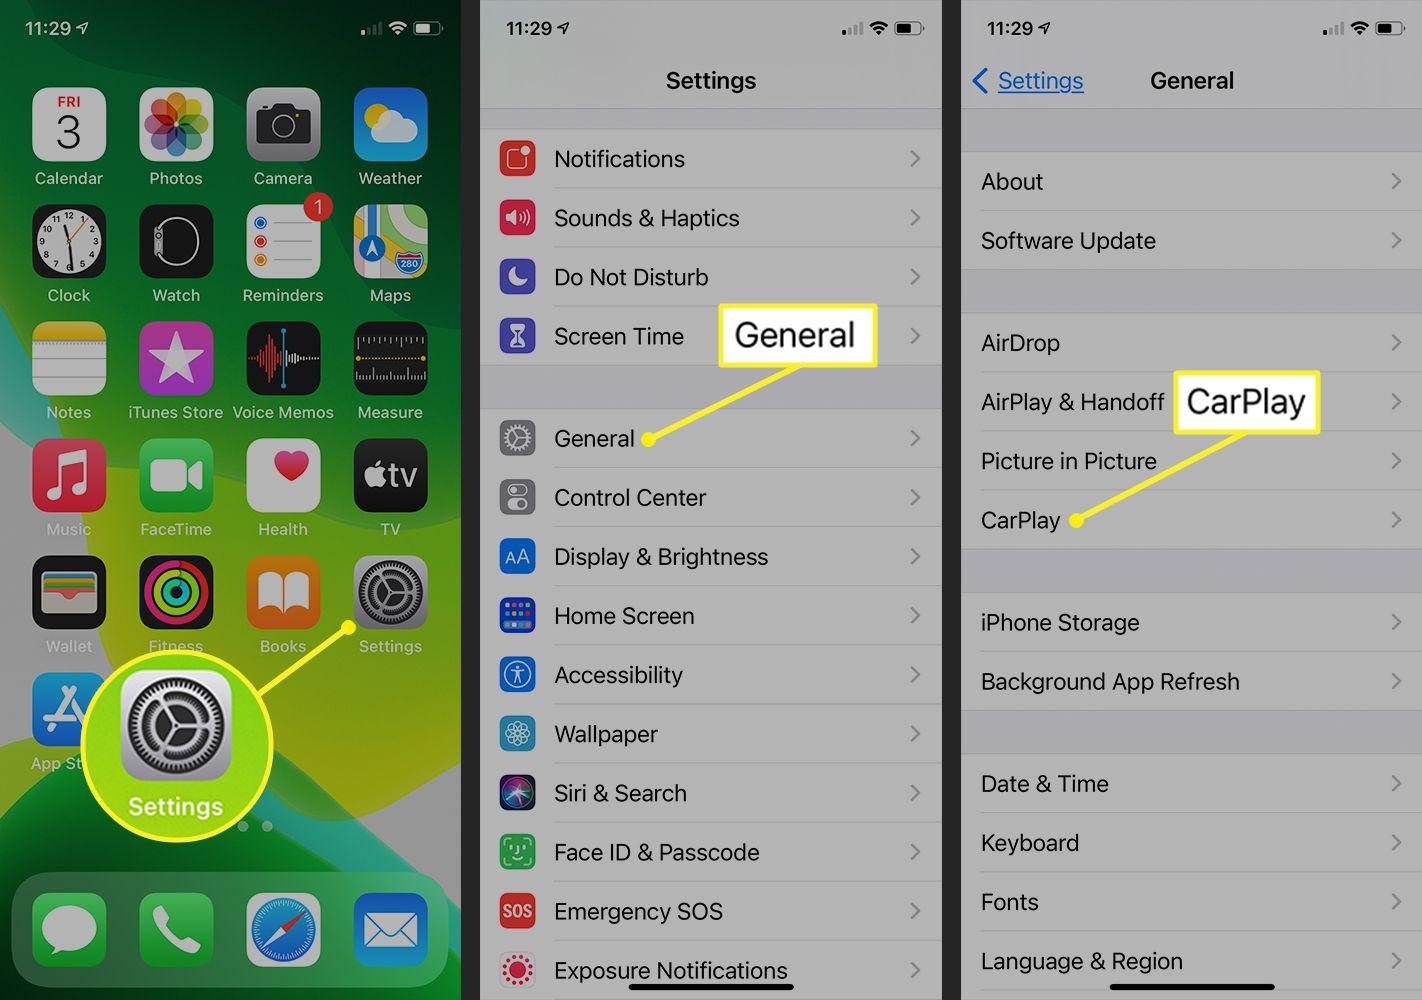 iPhone path to CarPlay selection